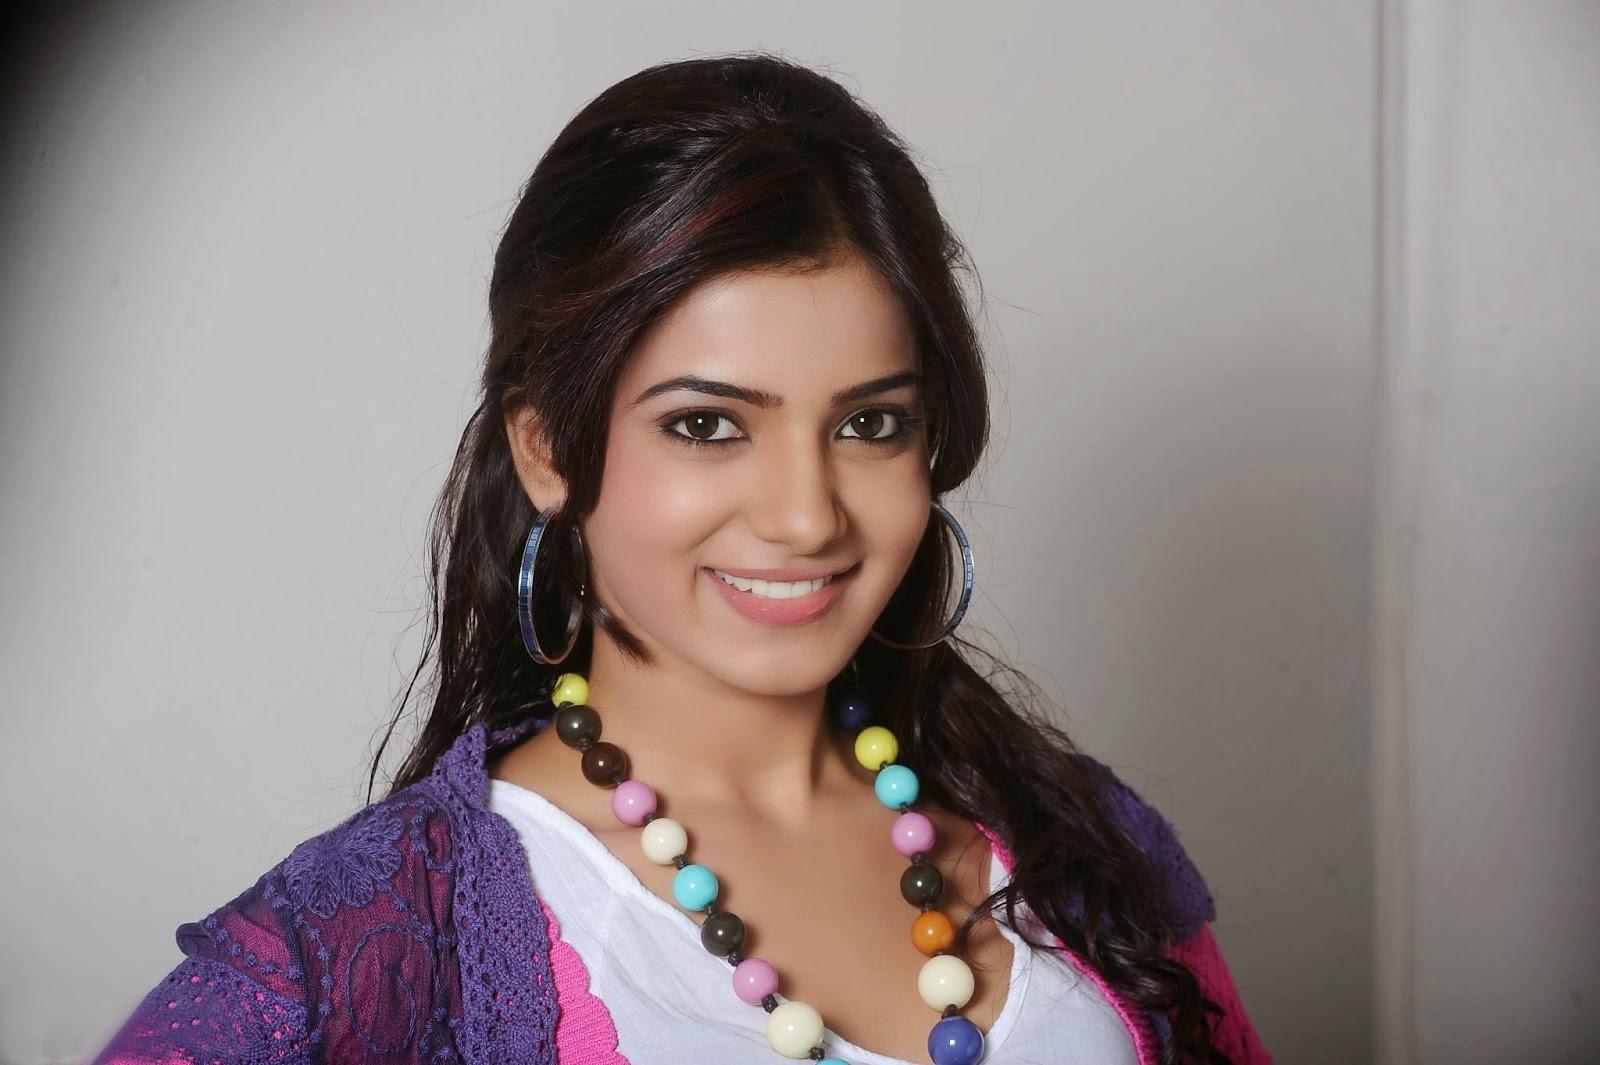 Telugu heroine images hd